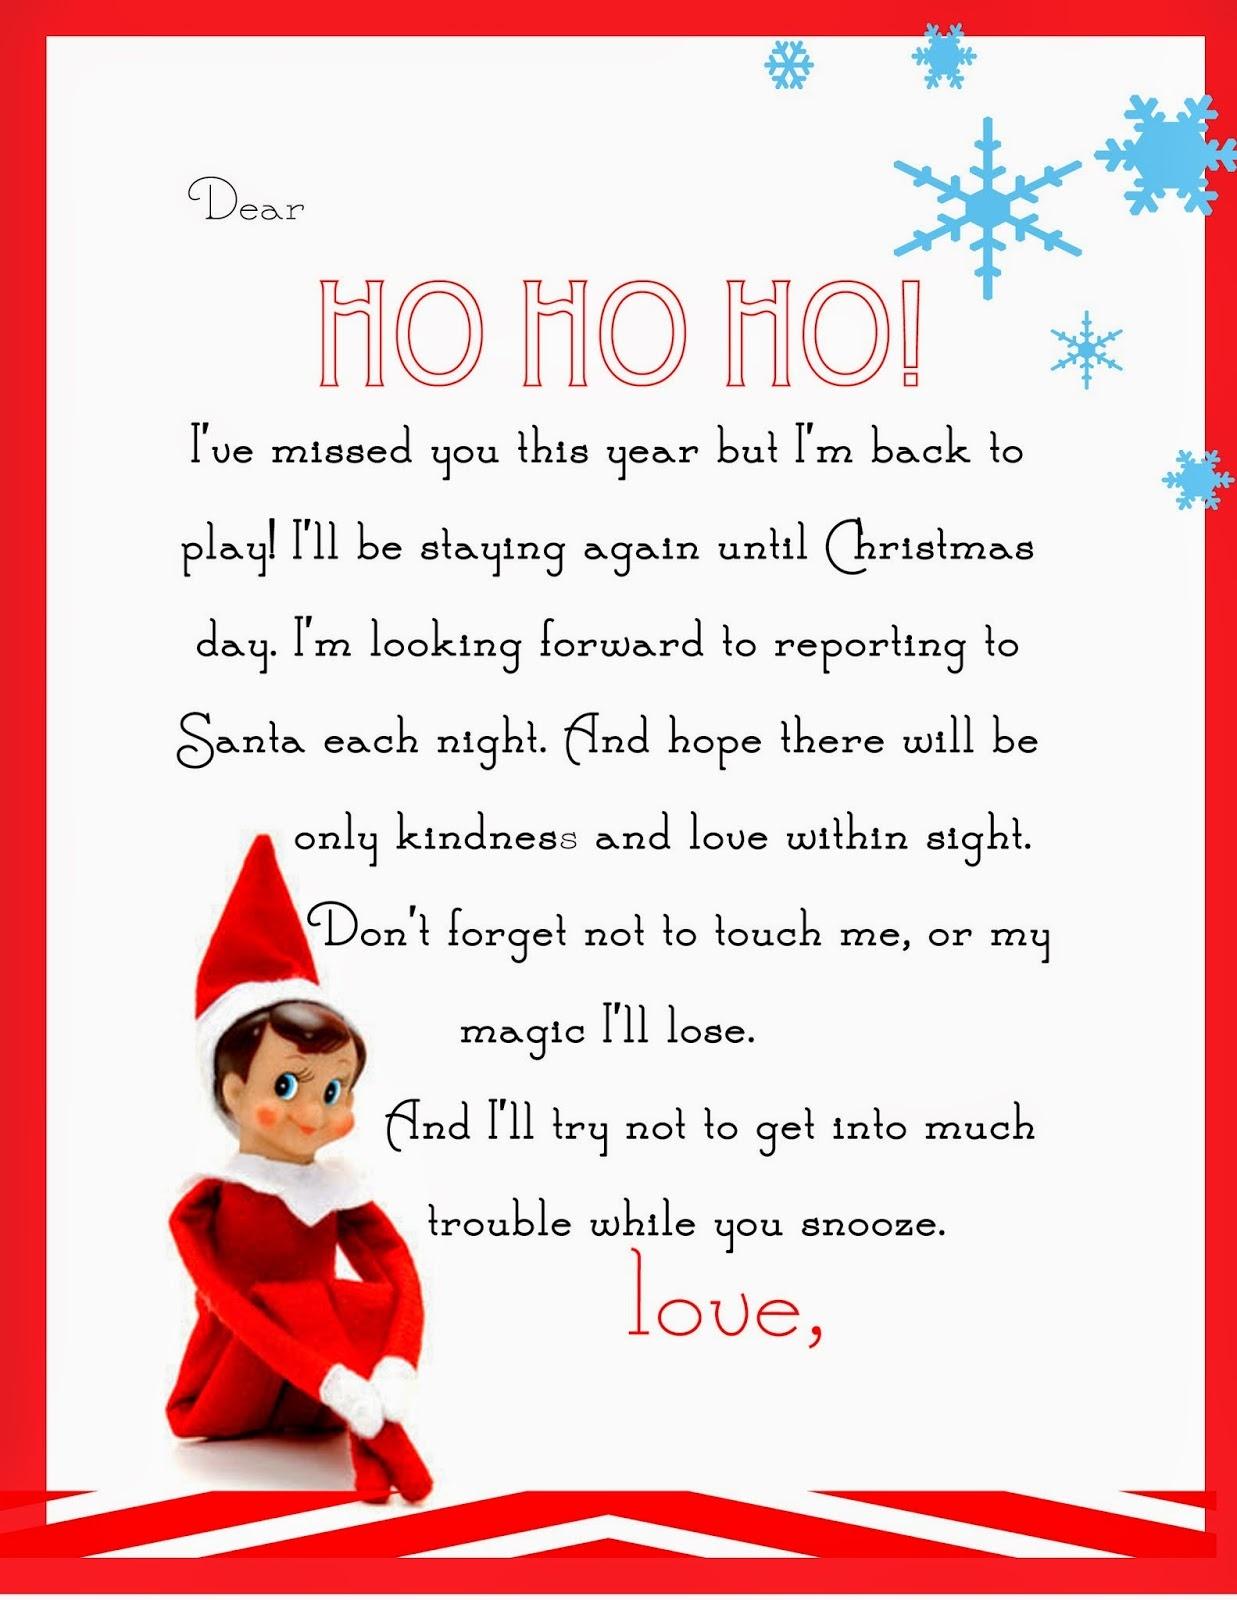 Elf On The Shelf Letter {Free Printable} - Free Elf On The Shelf Printables